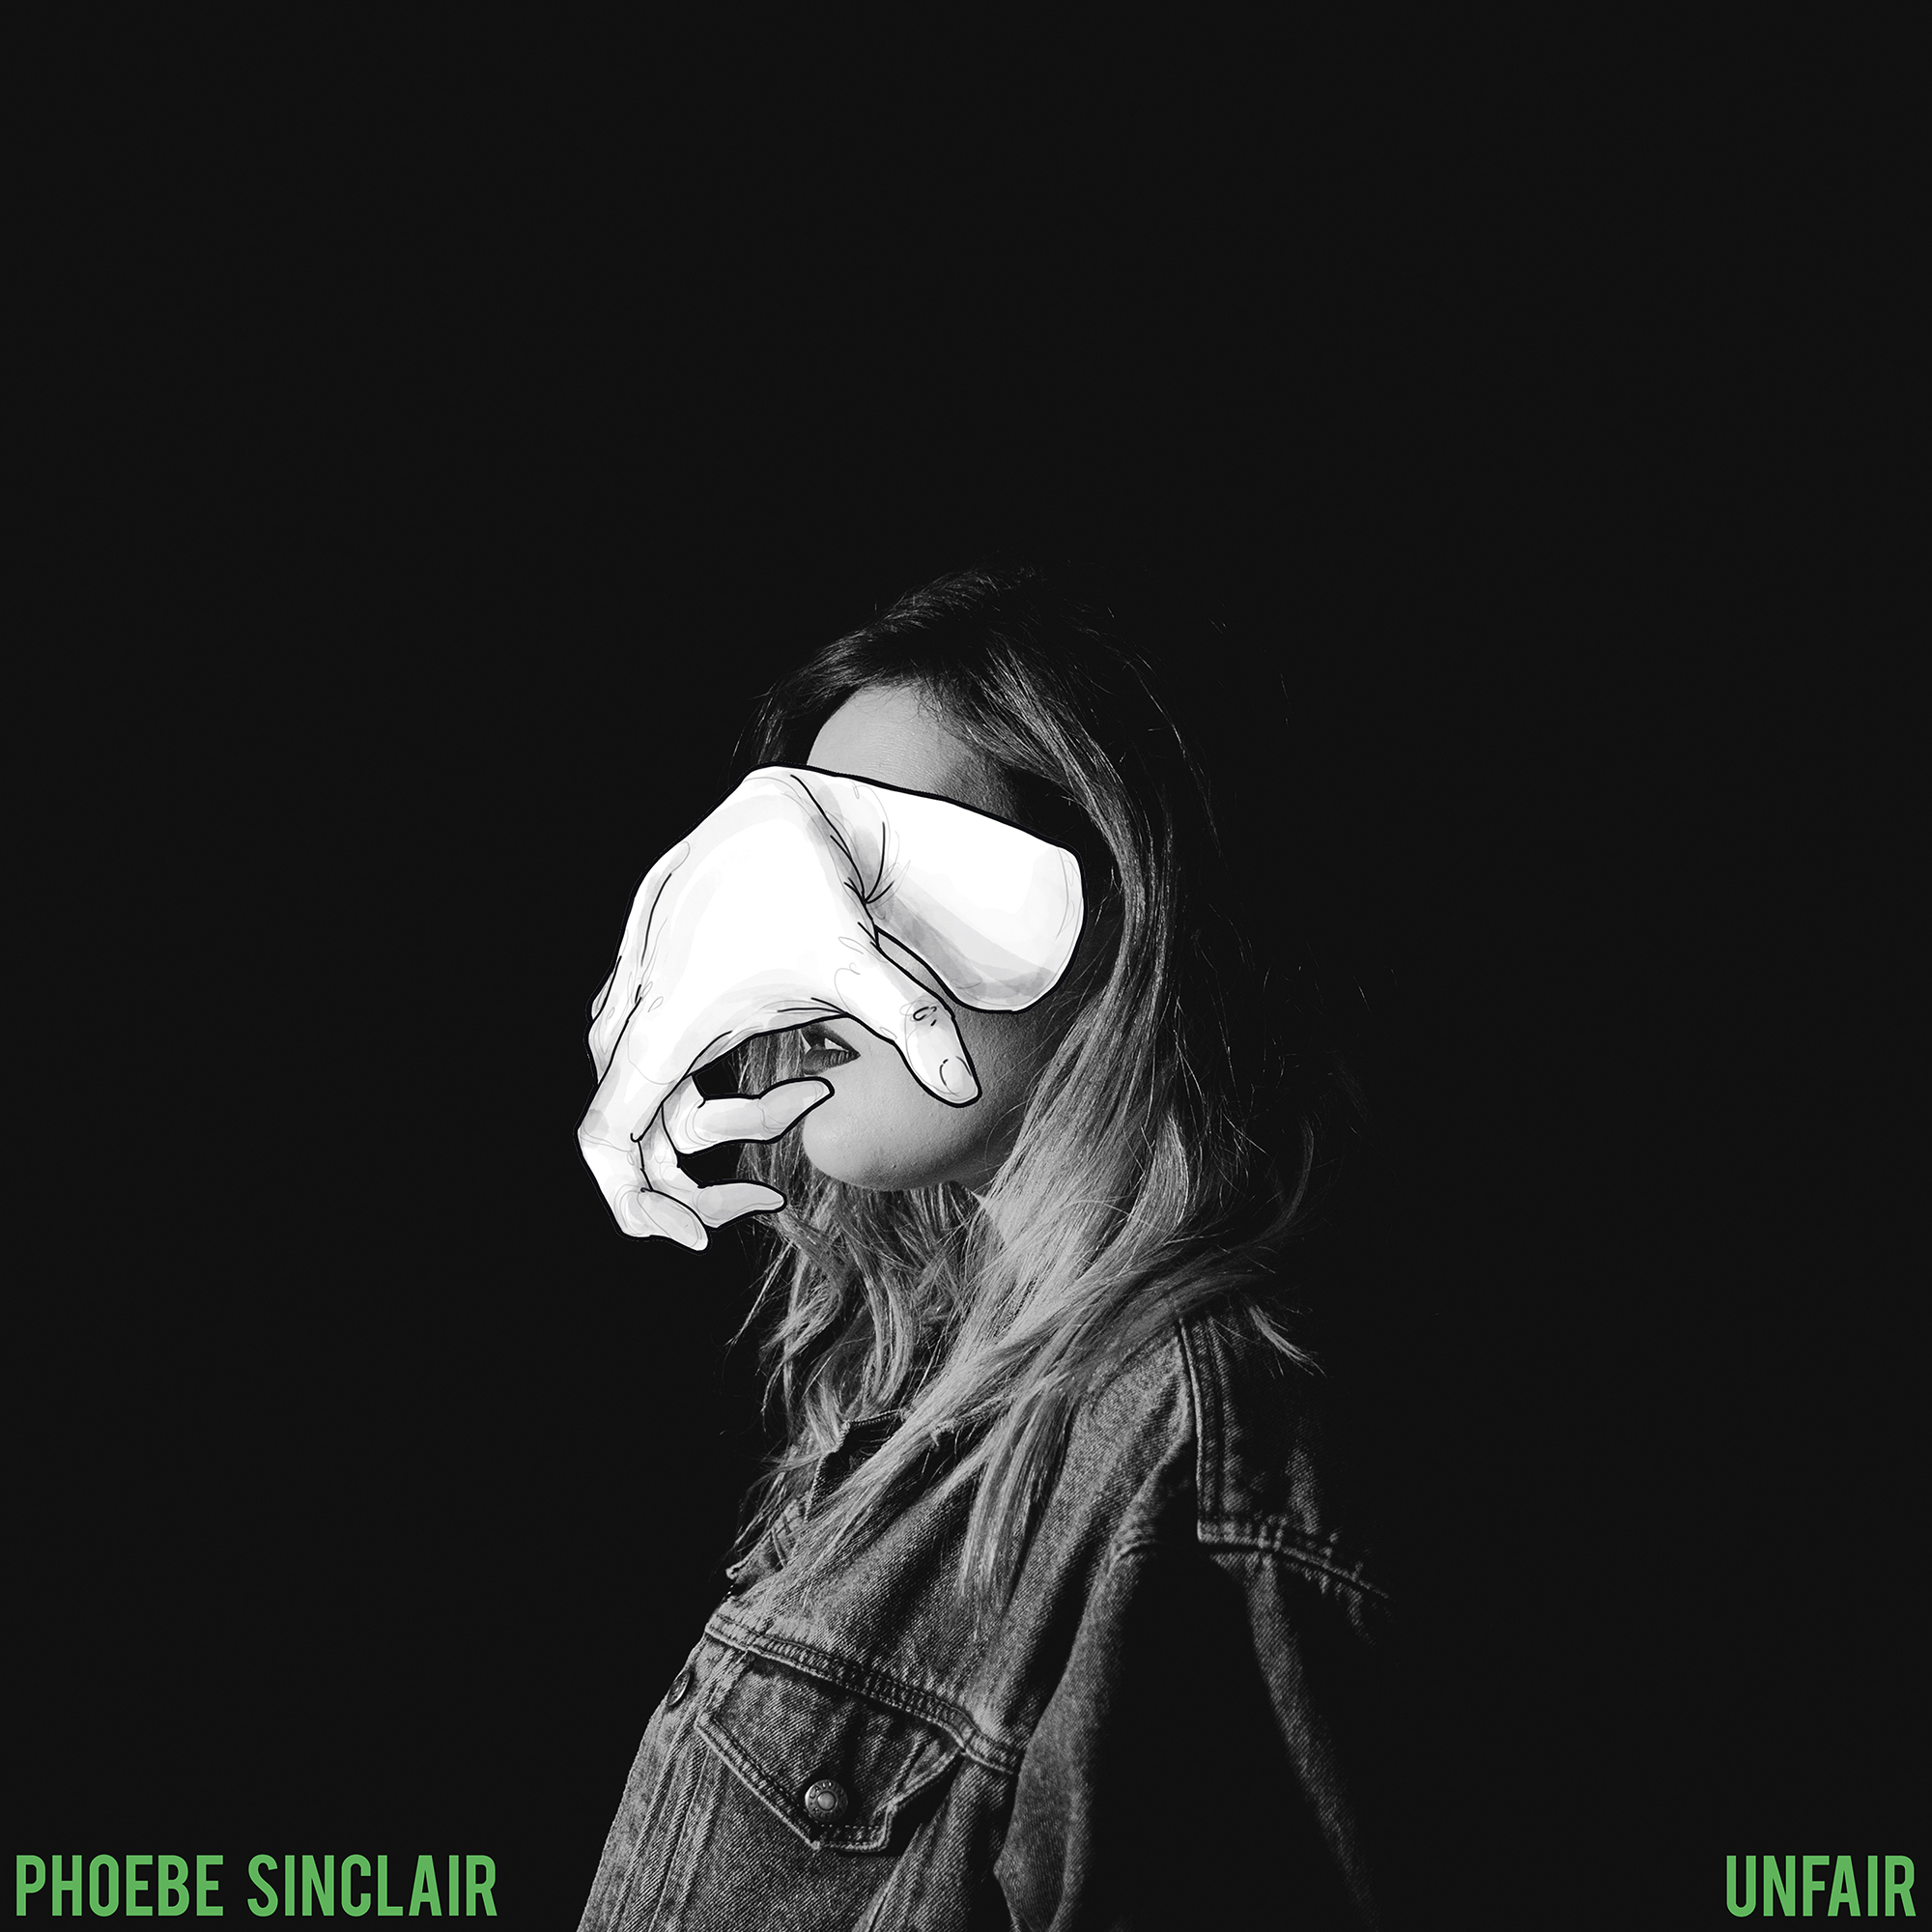 Phoebe Sinclair - Unfair - Amrap Airit.jpg